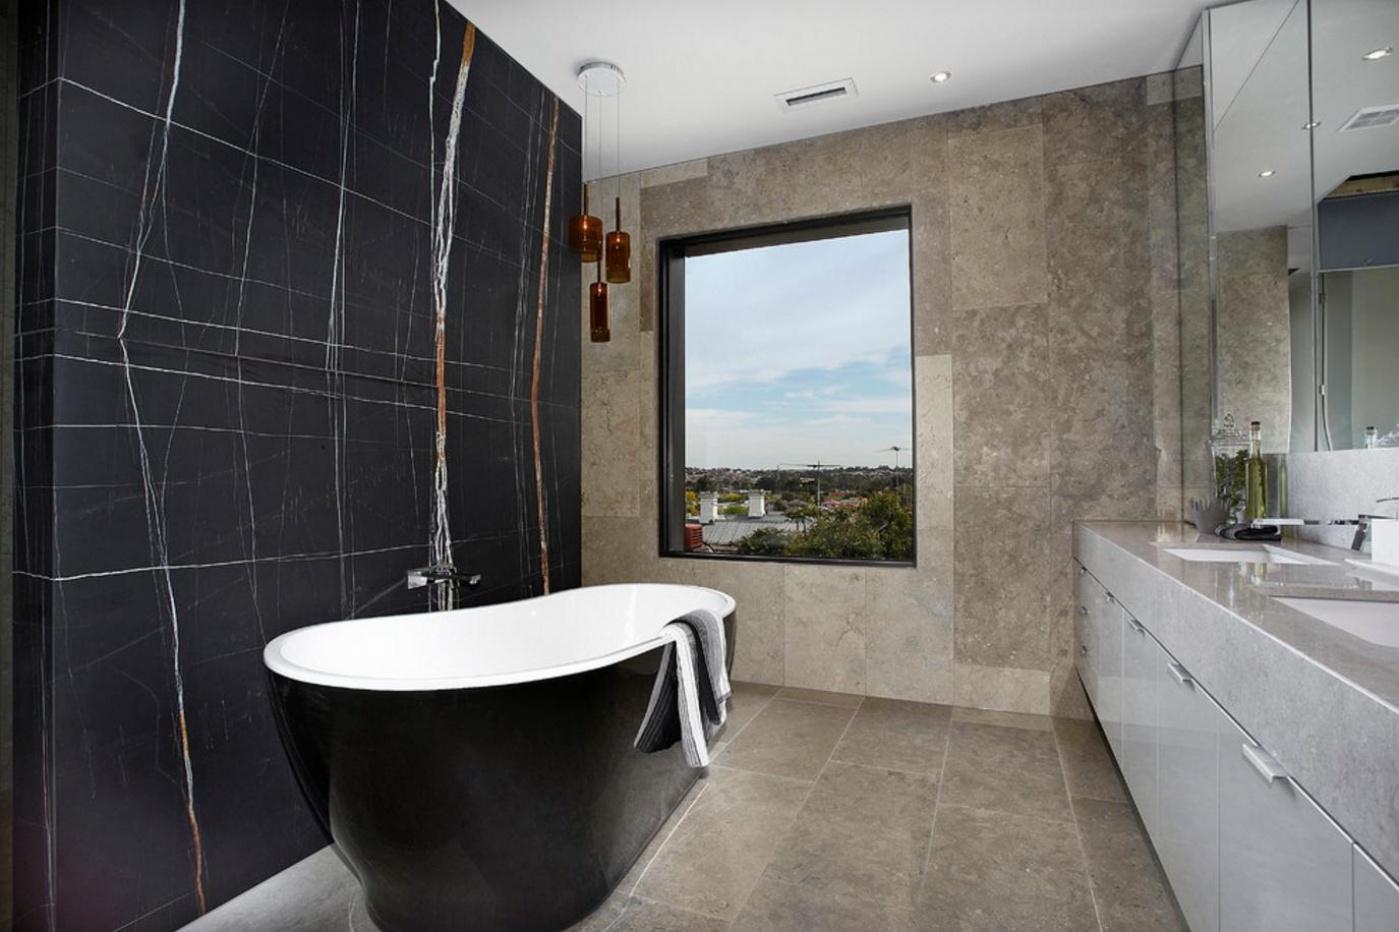 Pierre calcaire Salle de bain en marbre Noir du Sahara